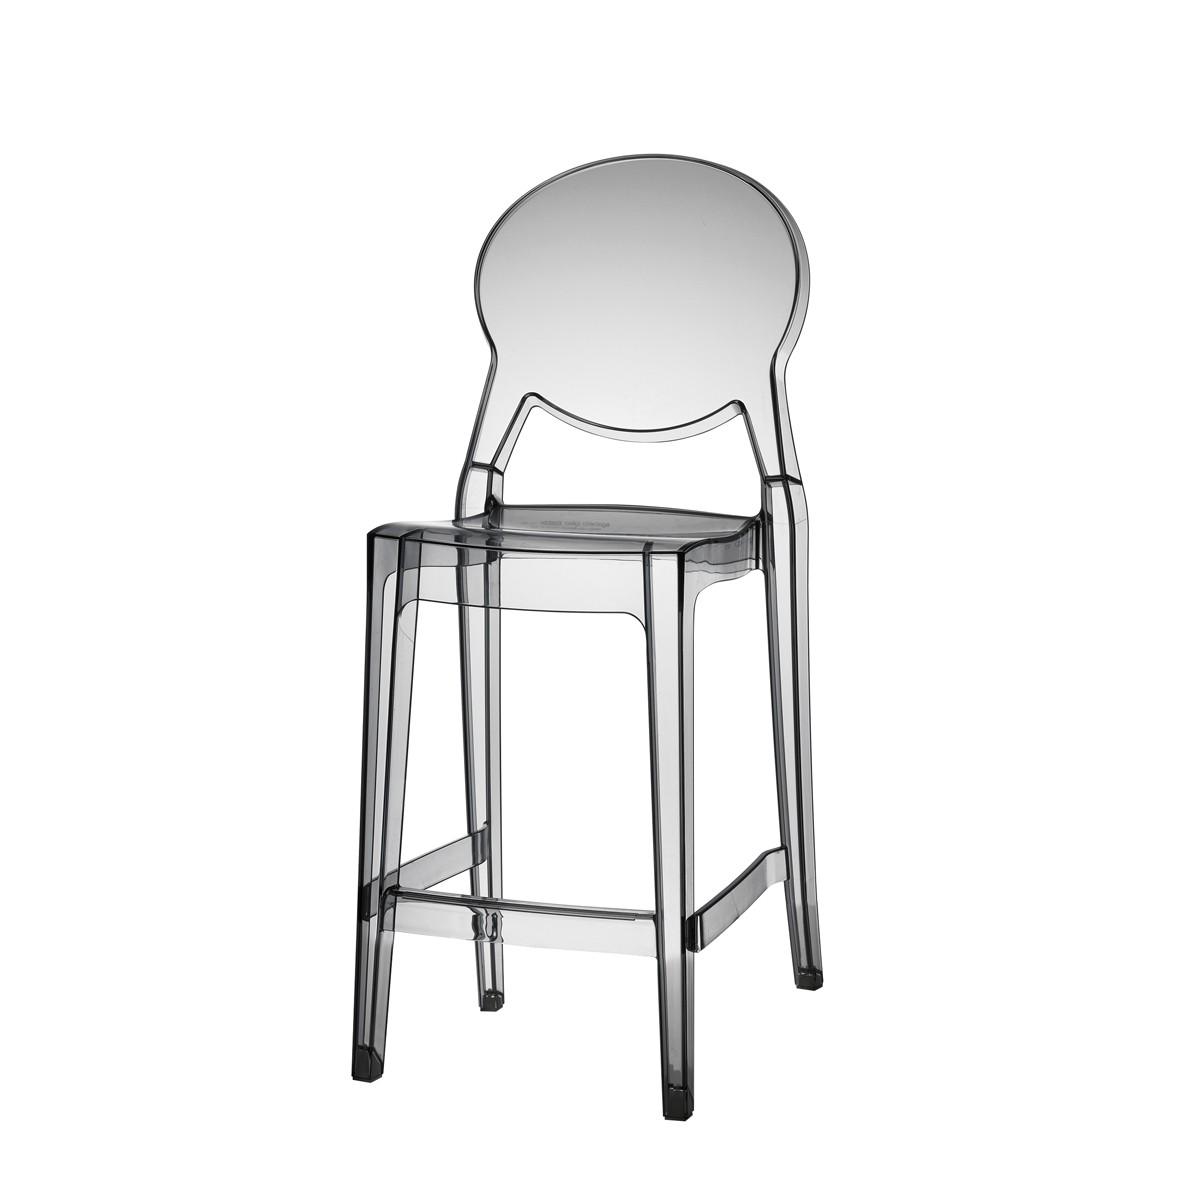 stołek barowy Igloo Scab Design